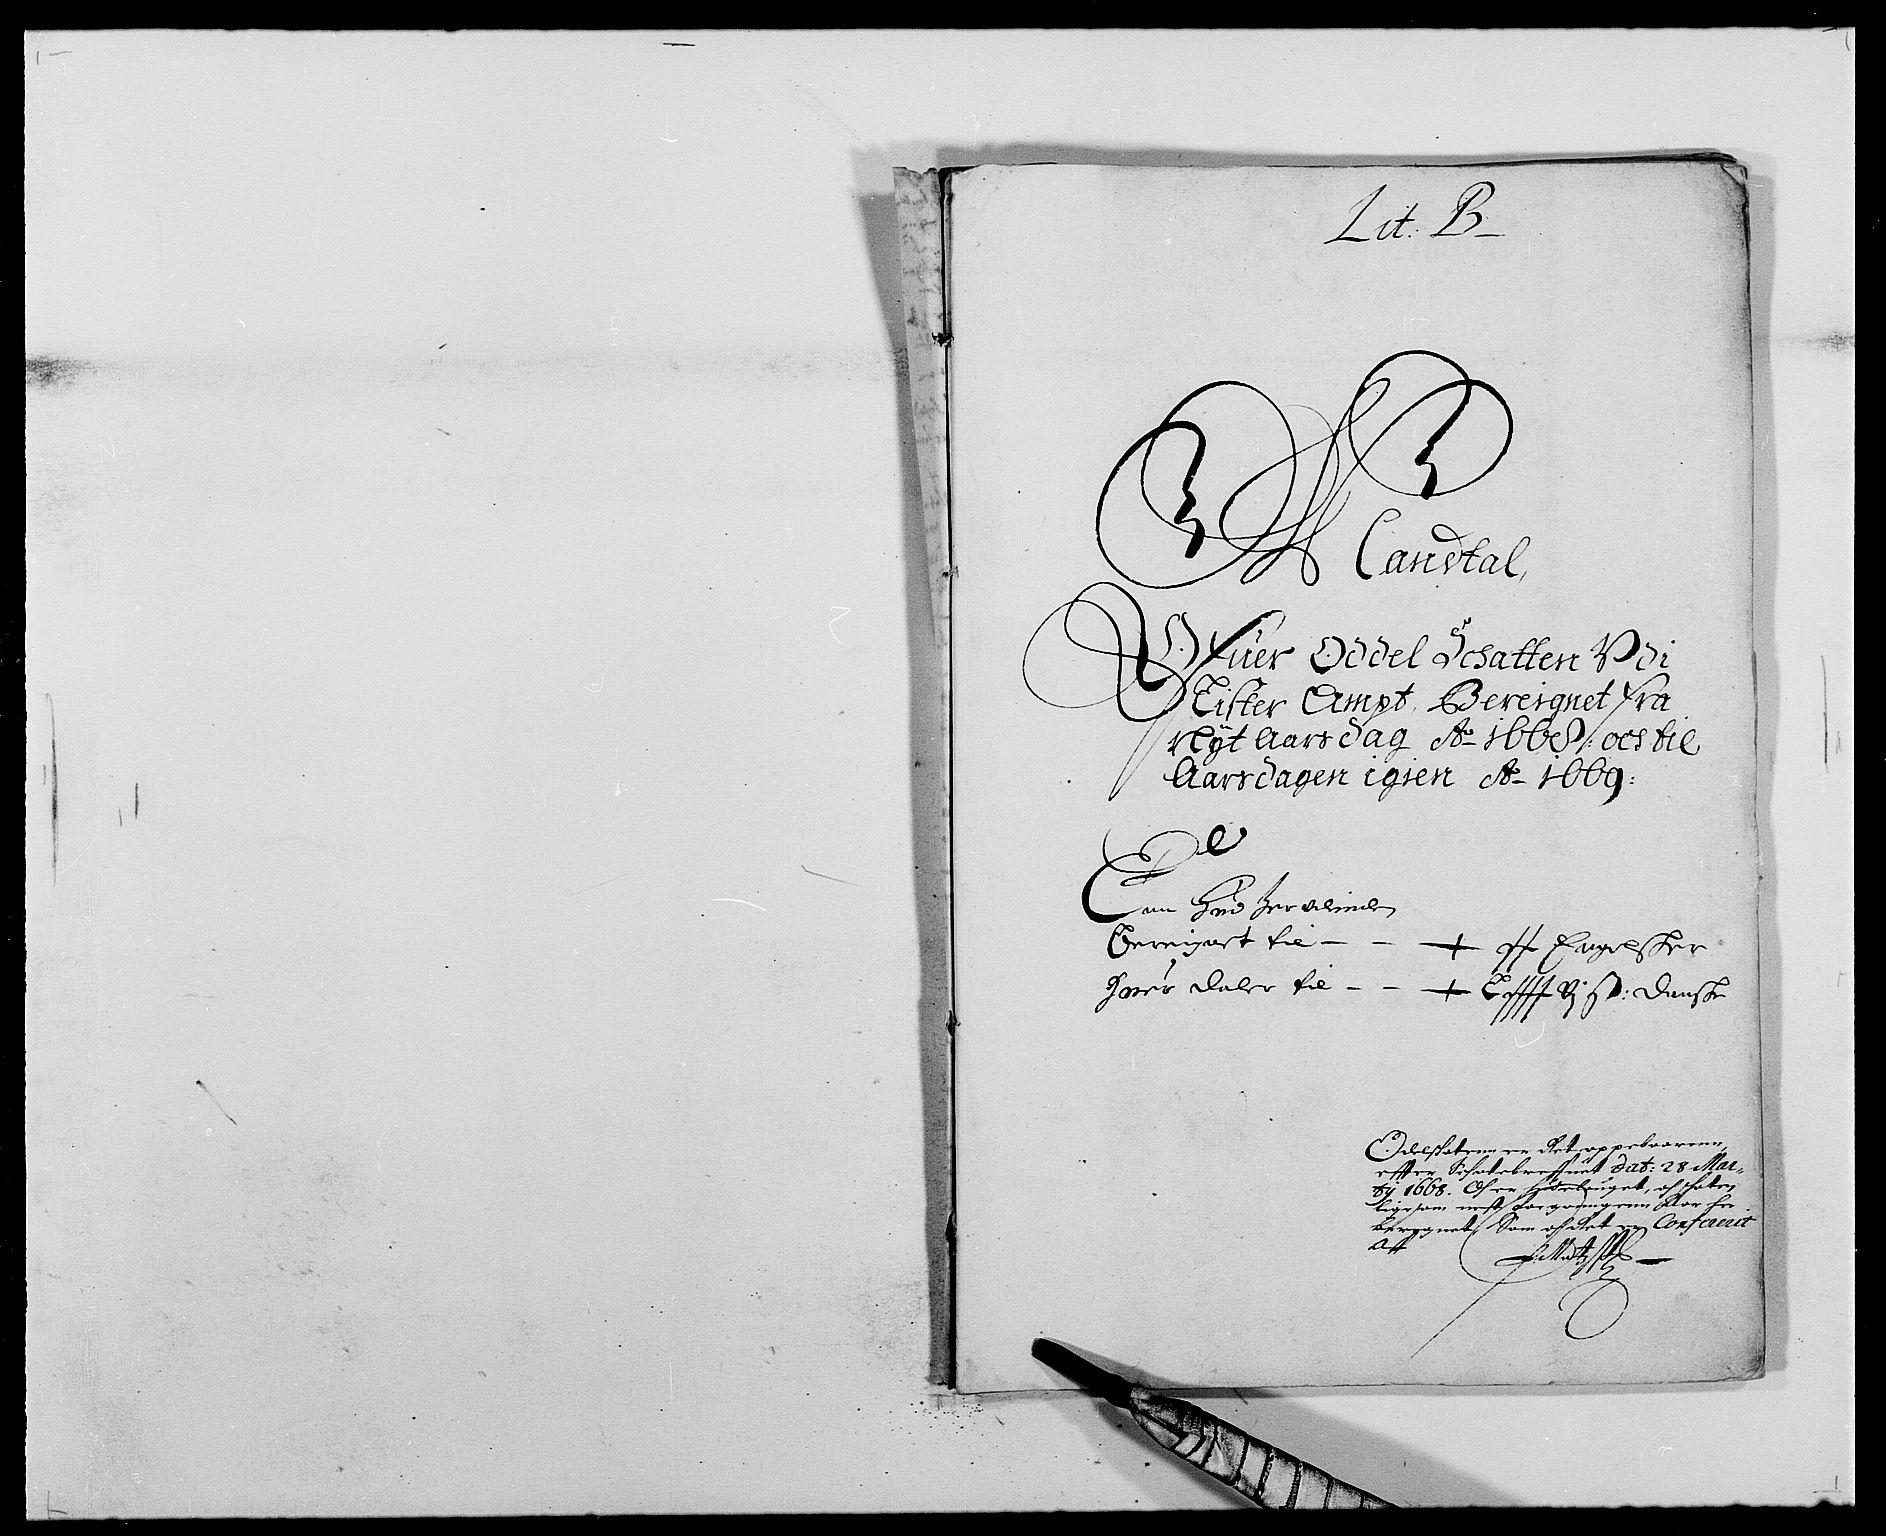 RA, Rentekammeret inntil 1814, Reviderte regnskaper, Fogderegnskap, R41/L2524: Fogderegnskap Lista, 1665-1668, s. 381